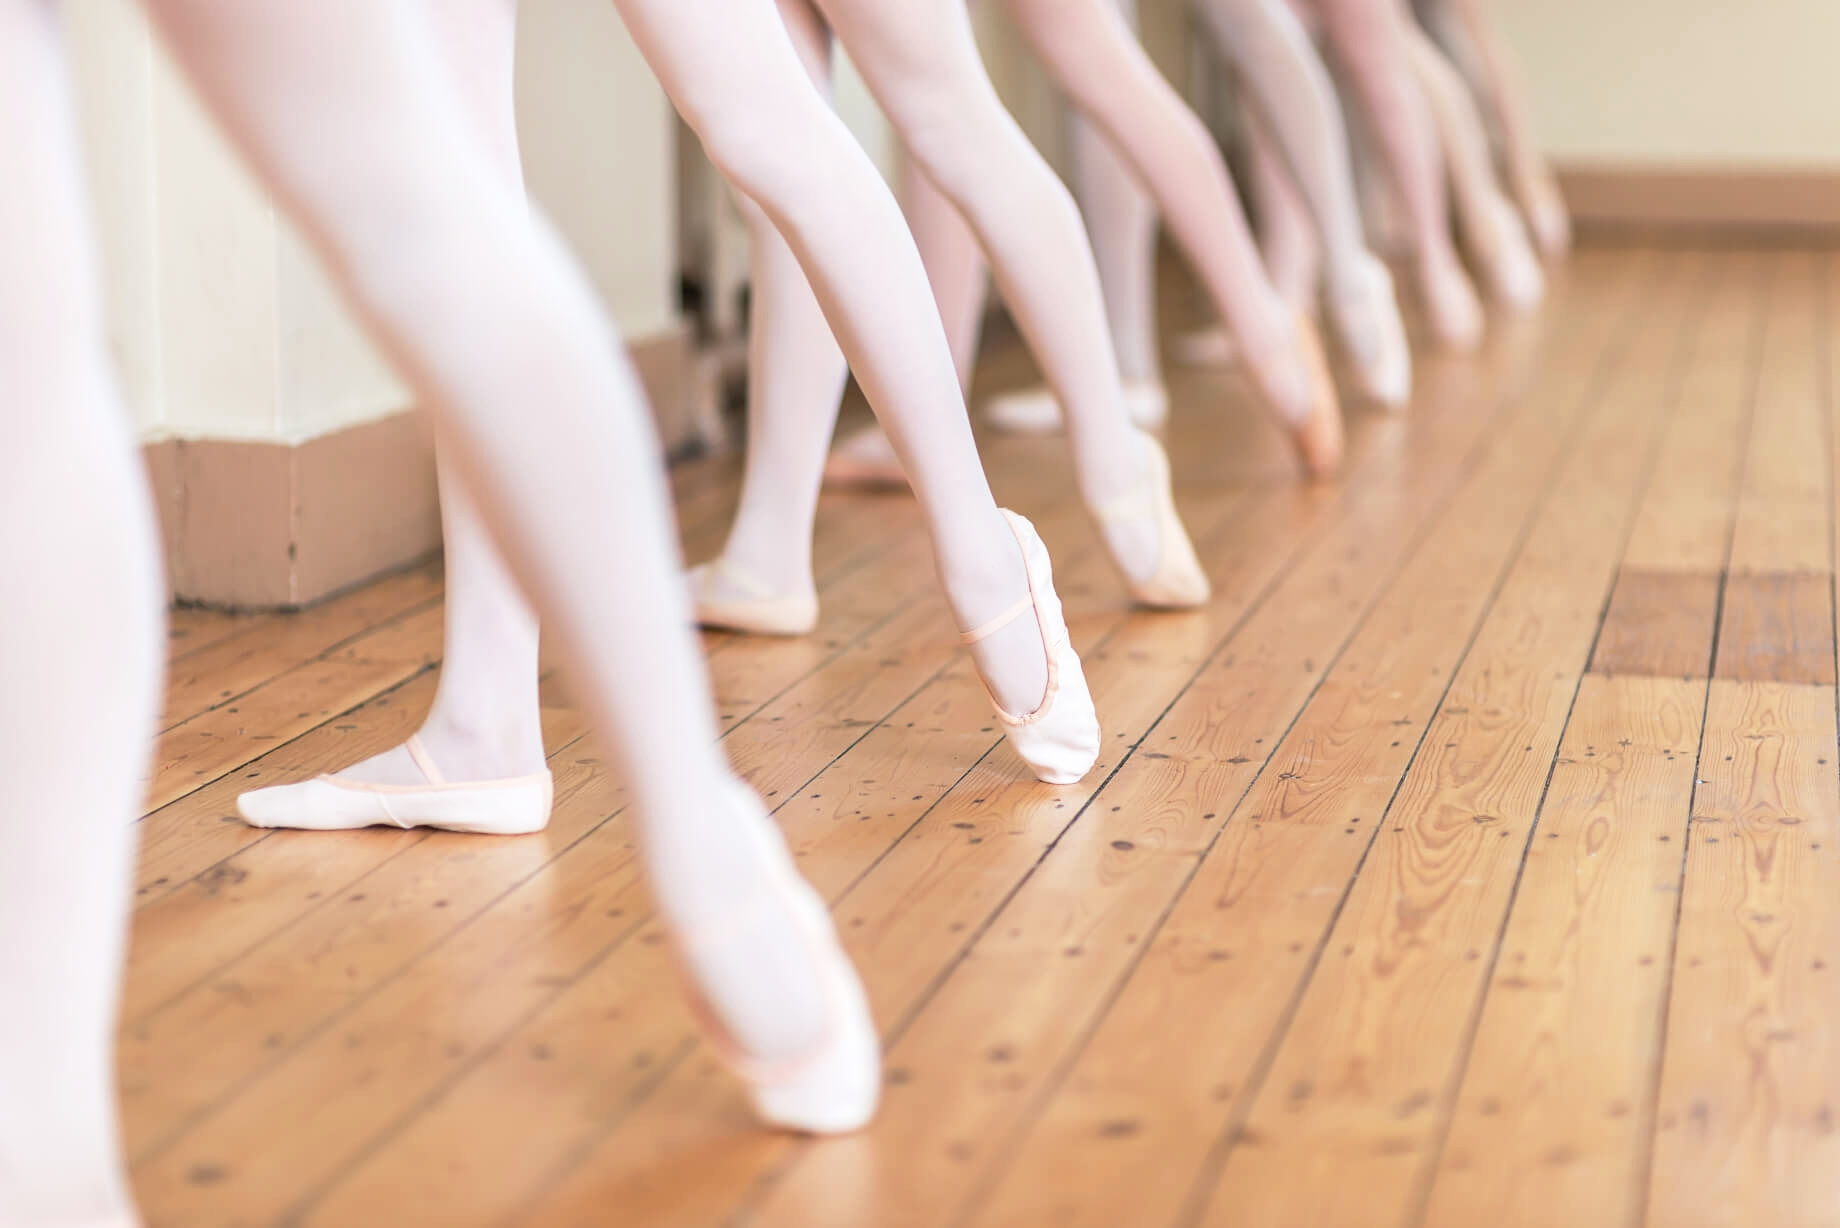 rnsd-ballet-shoes-dance-class-rutleigh-norris-school-birmingham-warwickshire-pink-wood-floor.jpg